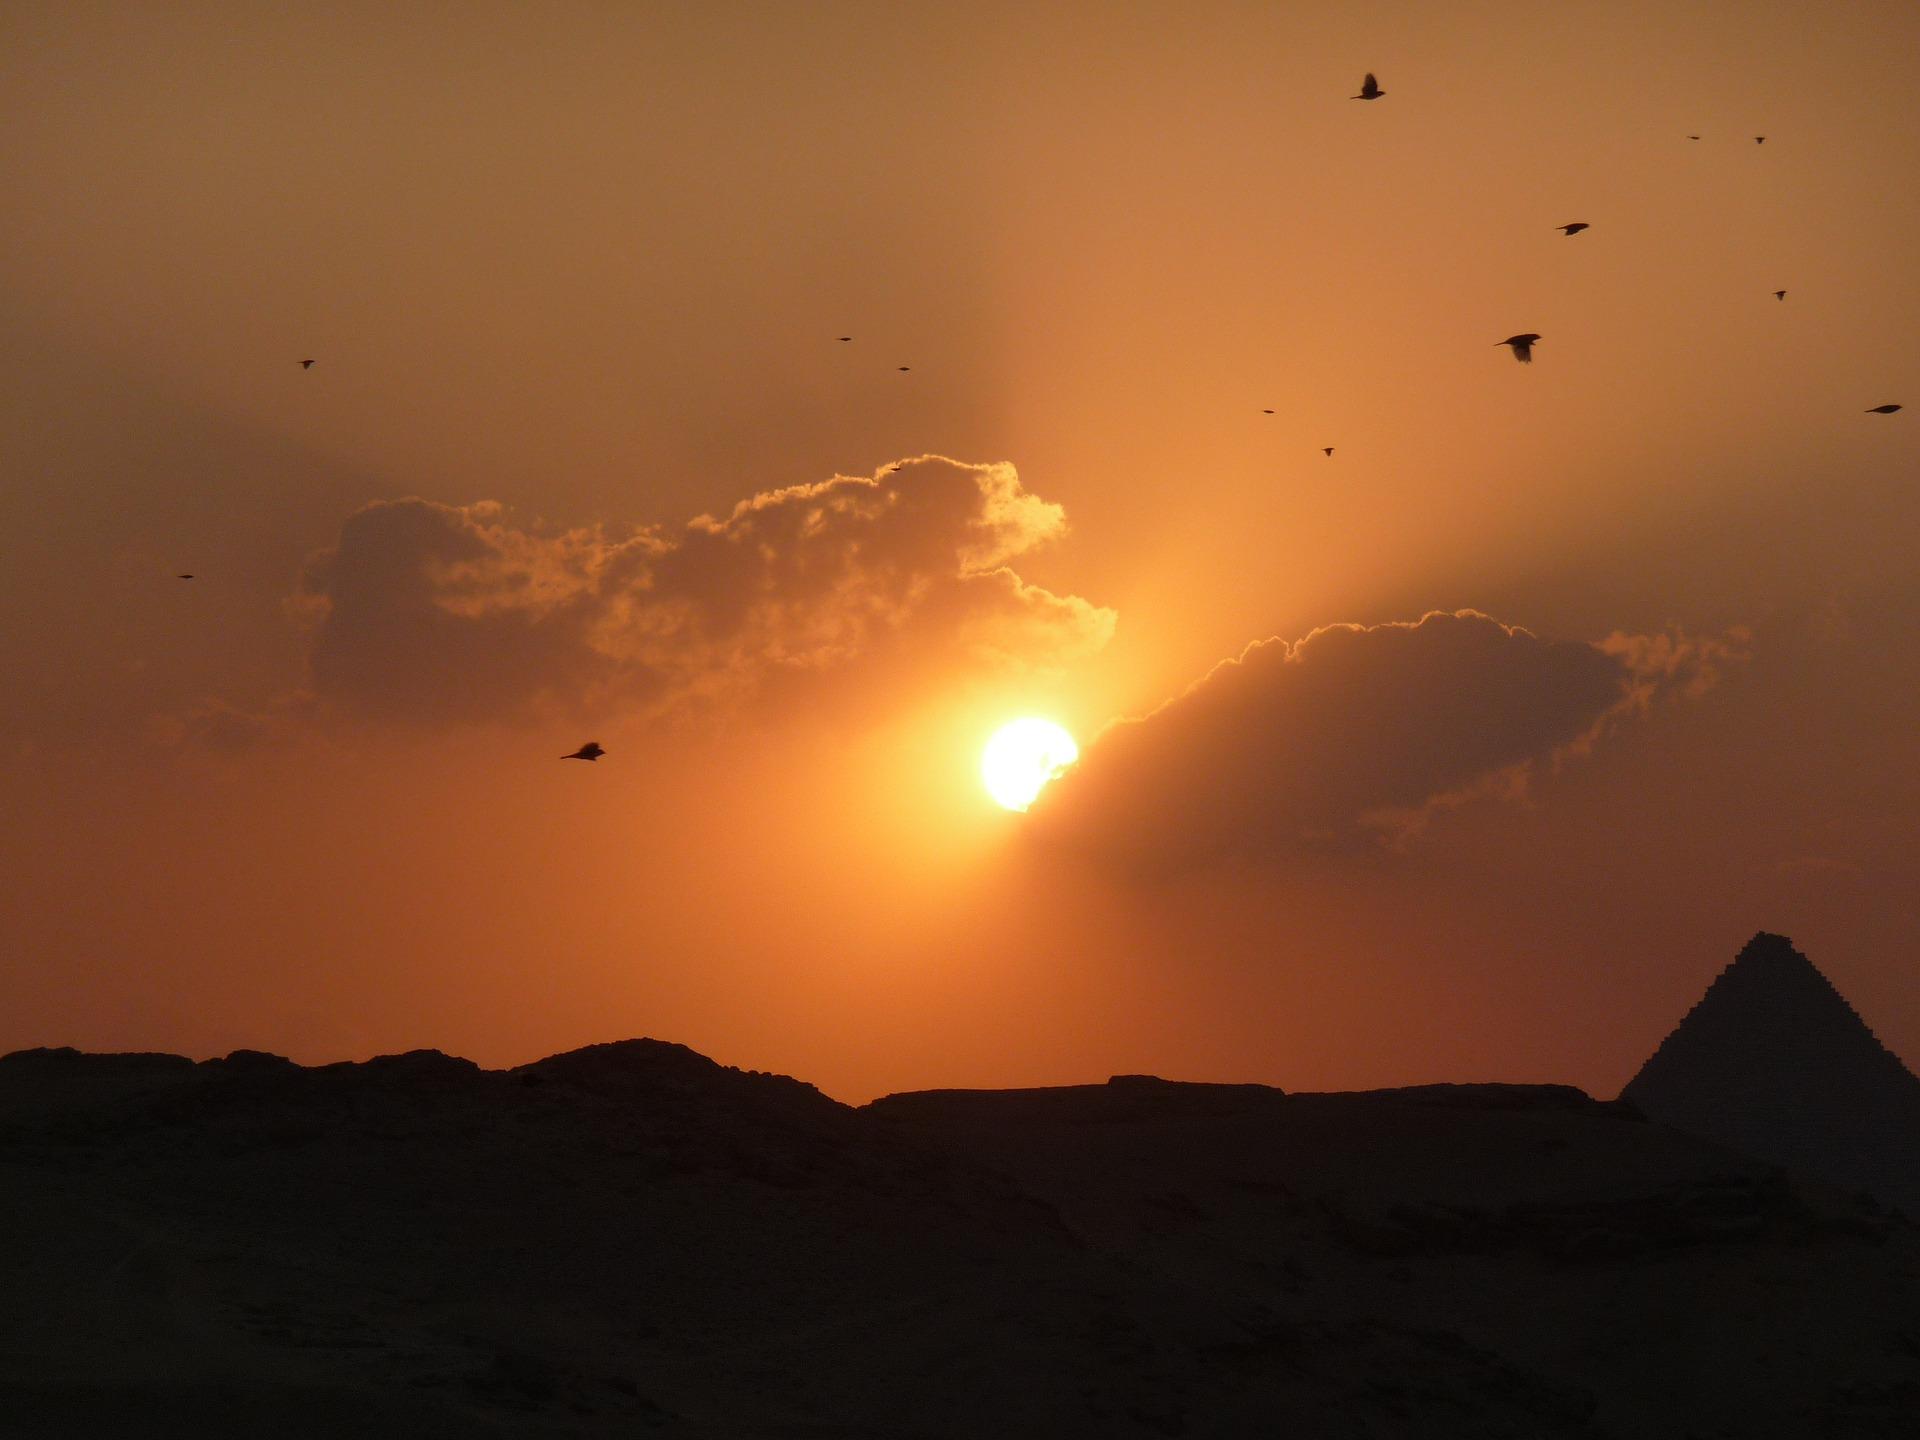 Götter im alten Ägypten: Pyramide im Sonnenuntergang